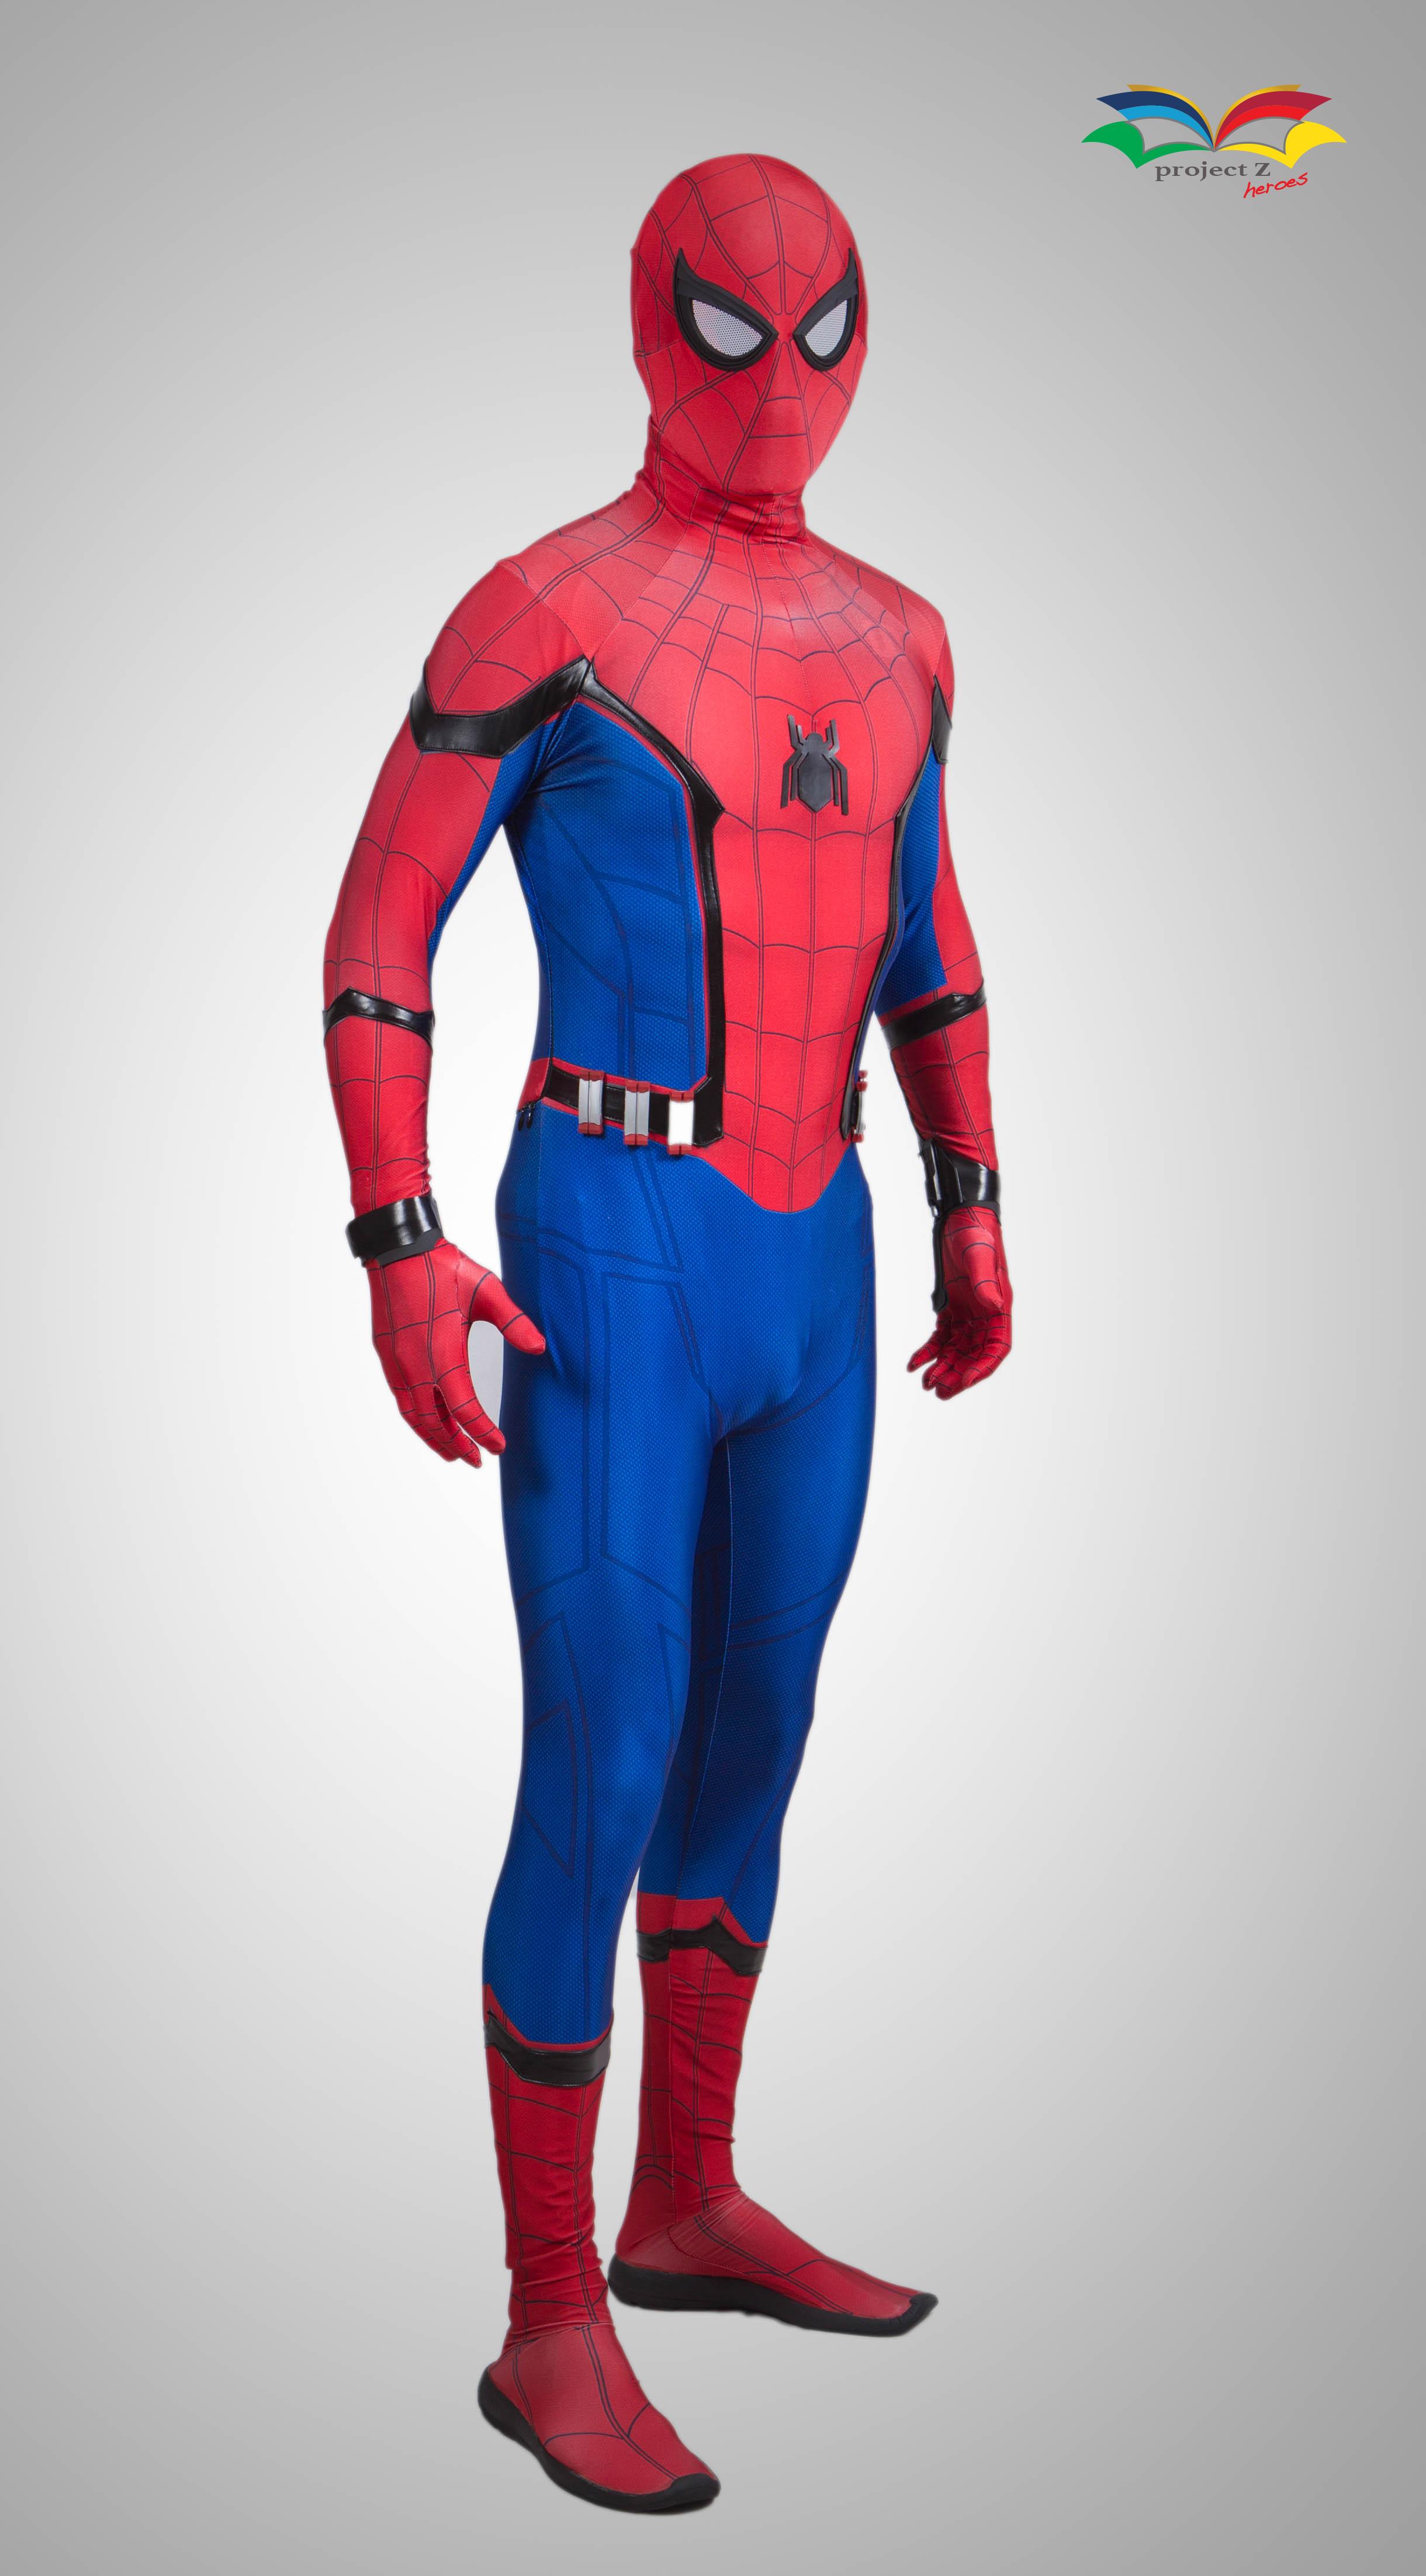 Spiderman homecoming costume frontsideway 1